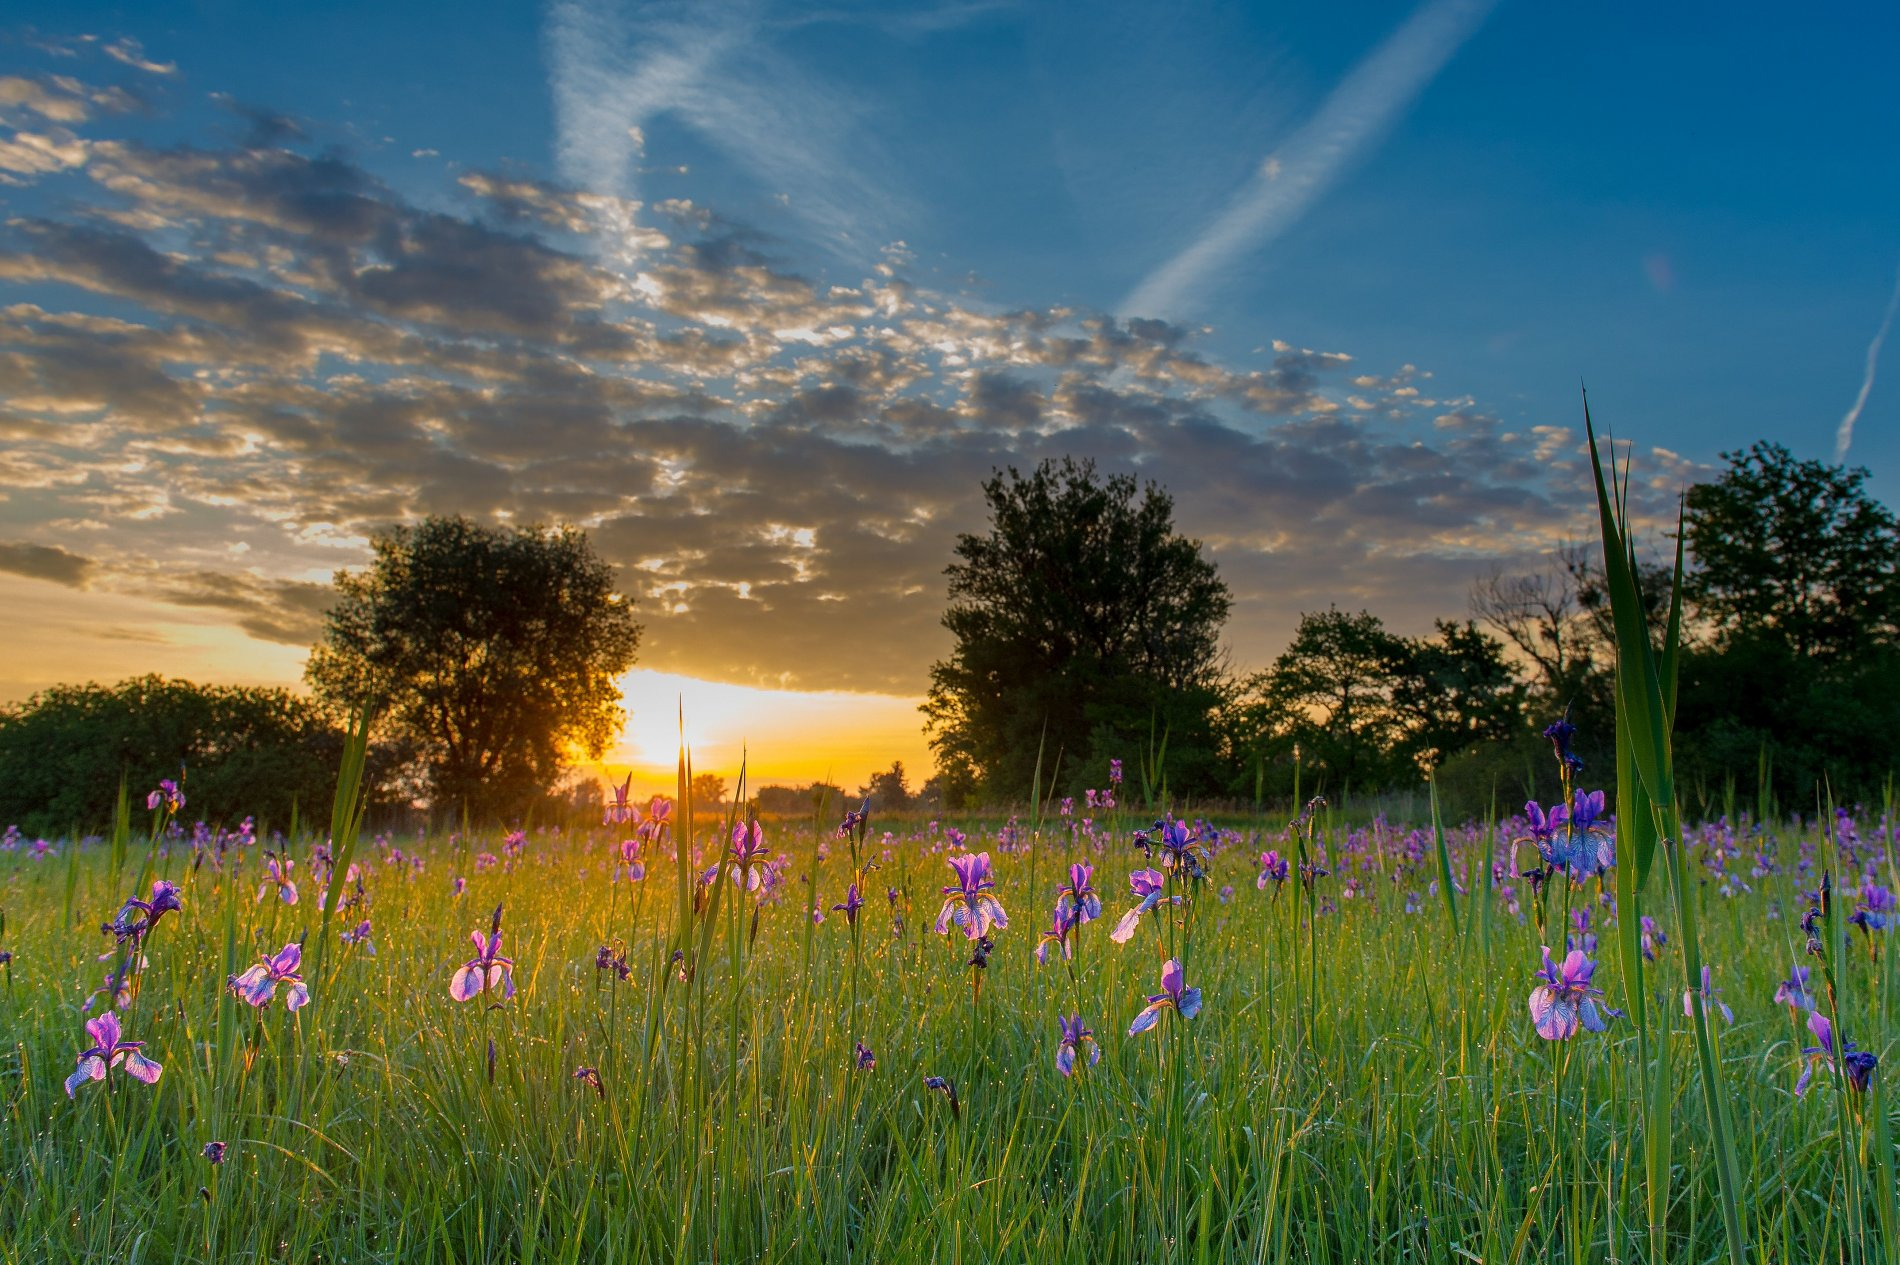 Iriswiese im Sonnenuntergang